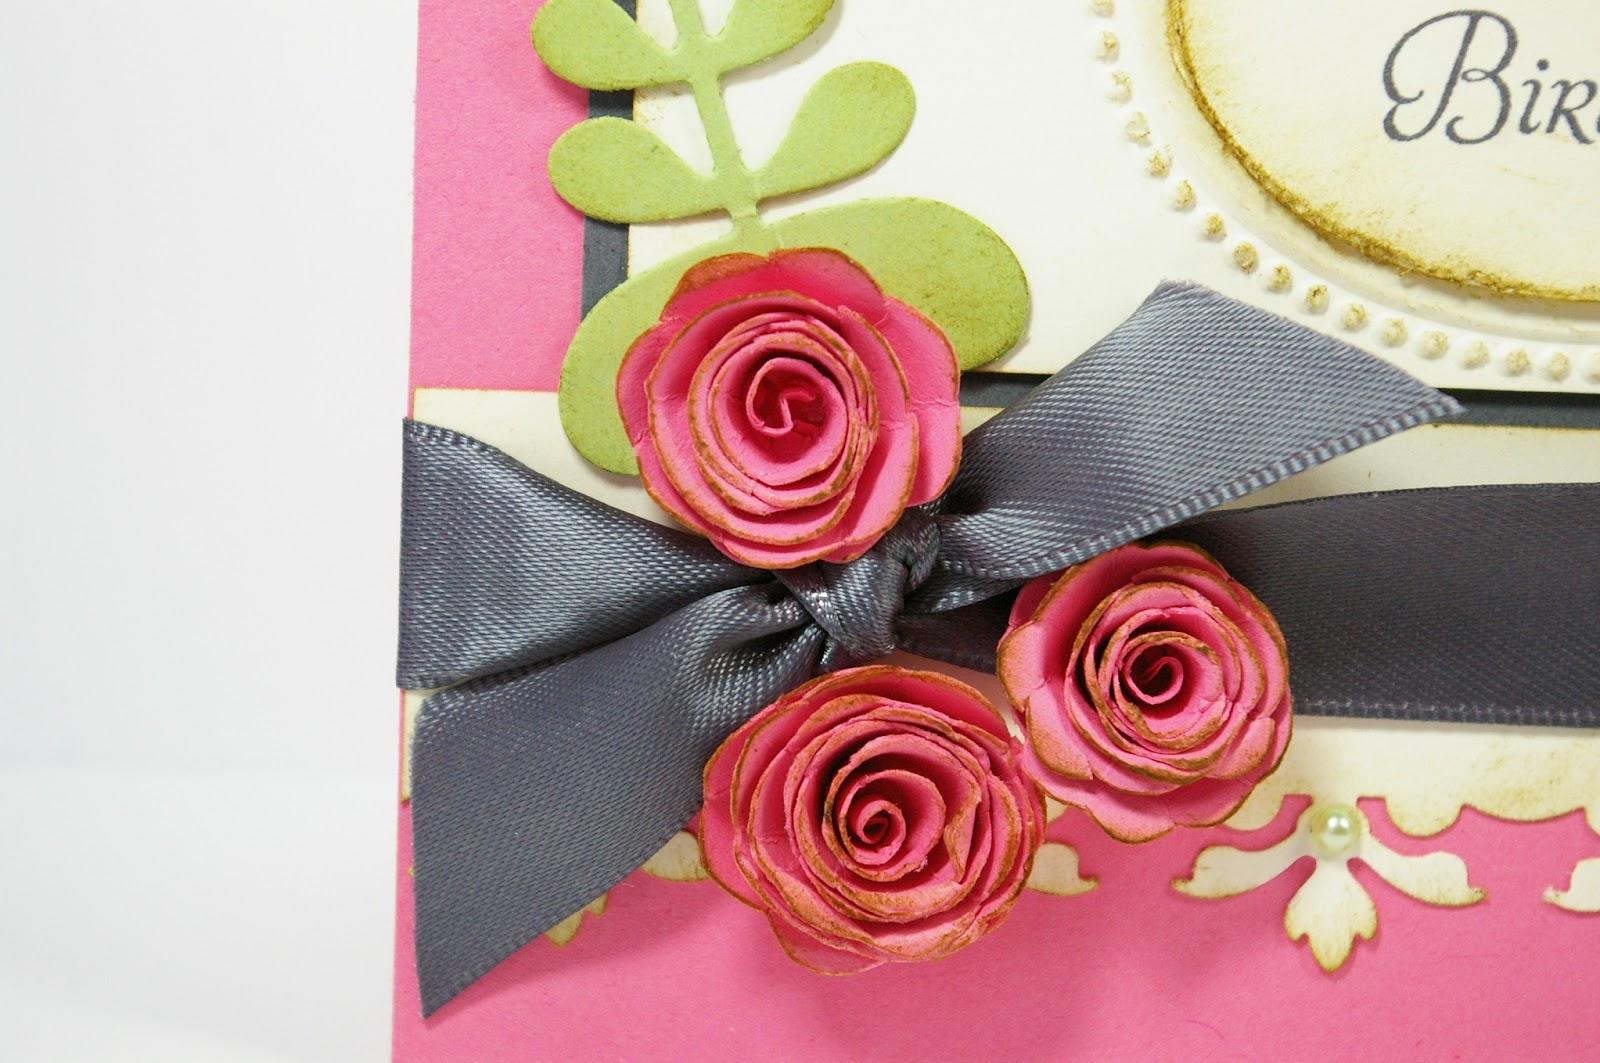 Handmade Flowers - Hand Made Flower Close Up